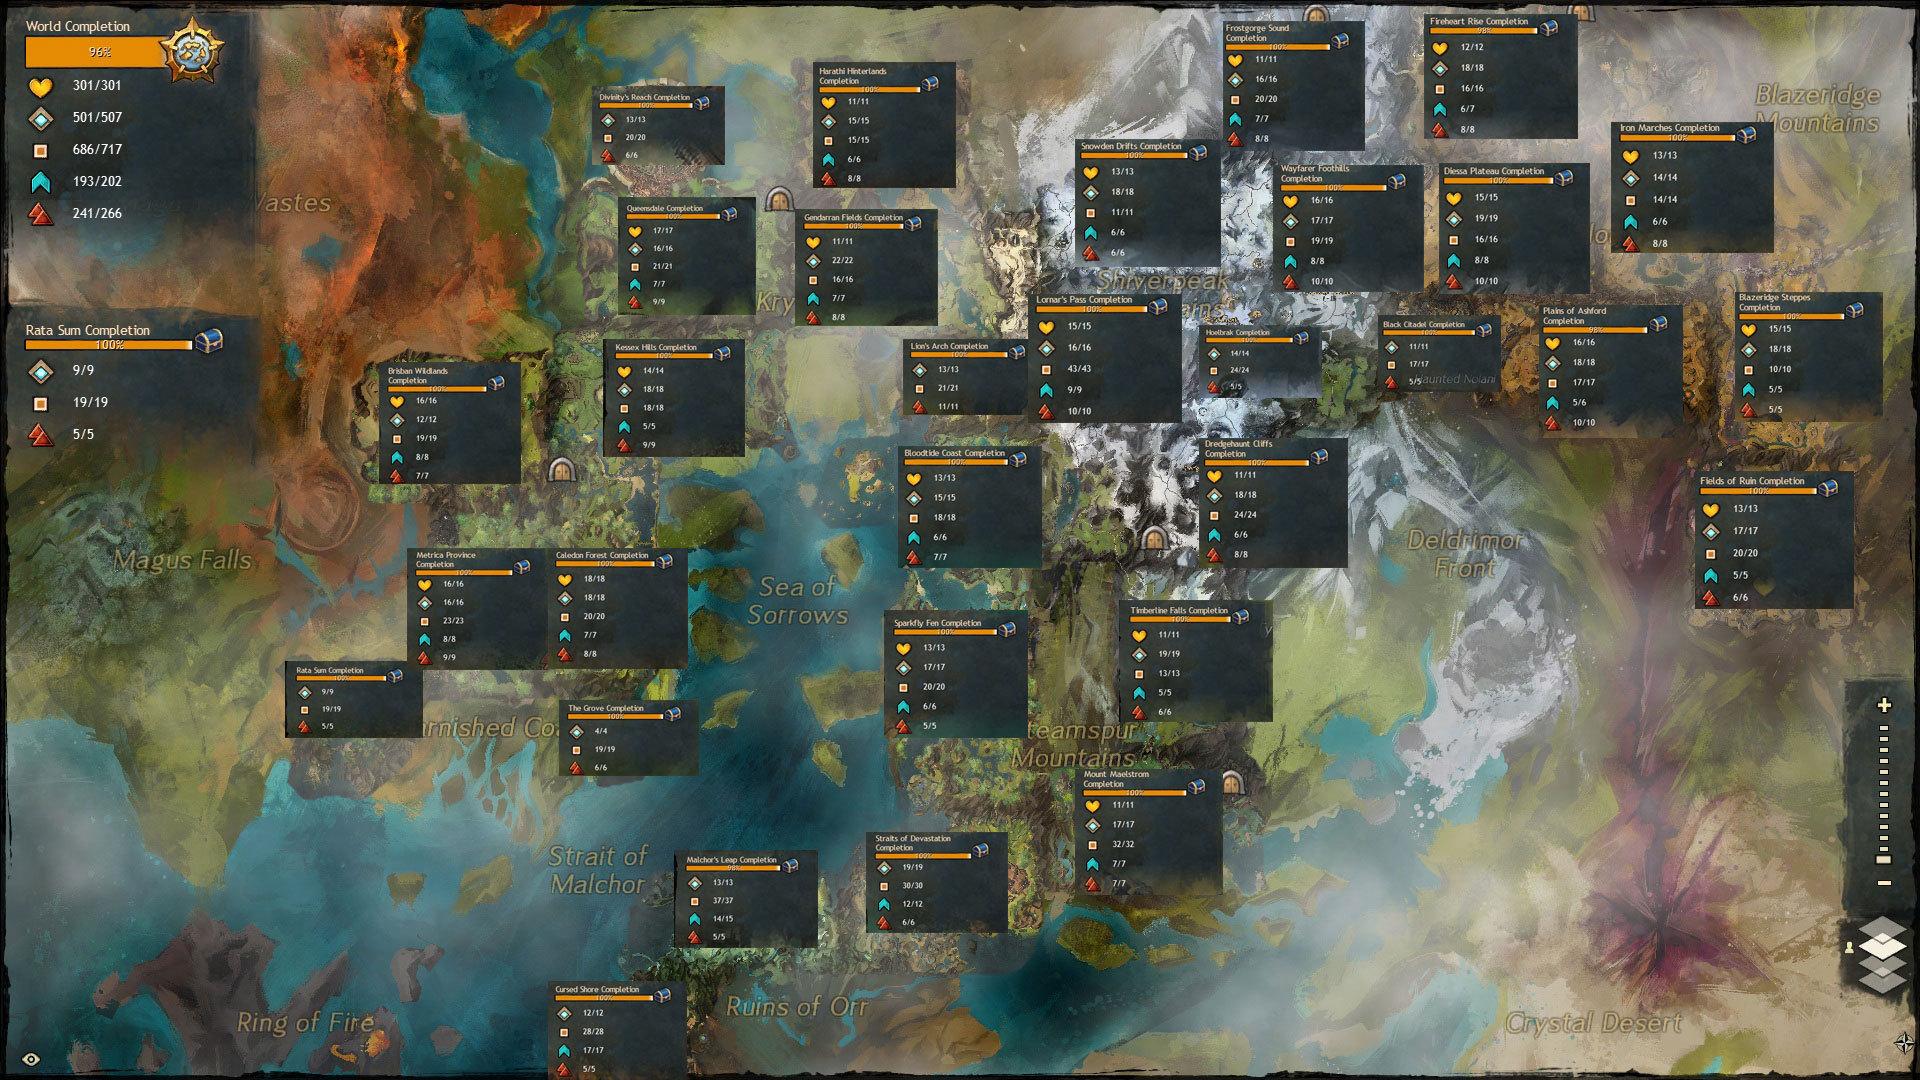 Gw2 Karte.Gw2 Map Completion World Map 07